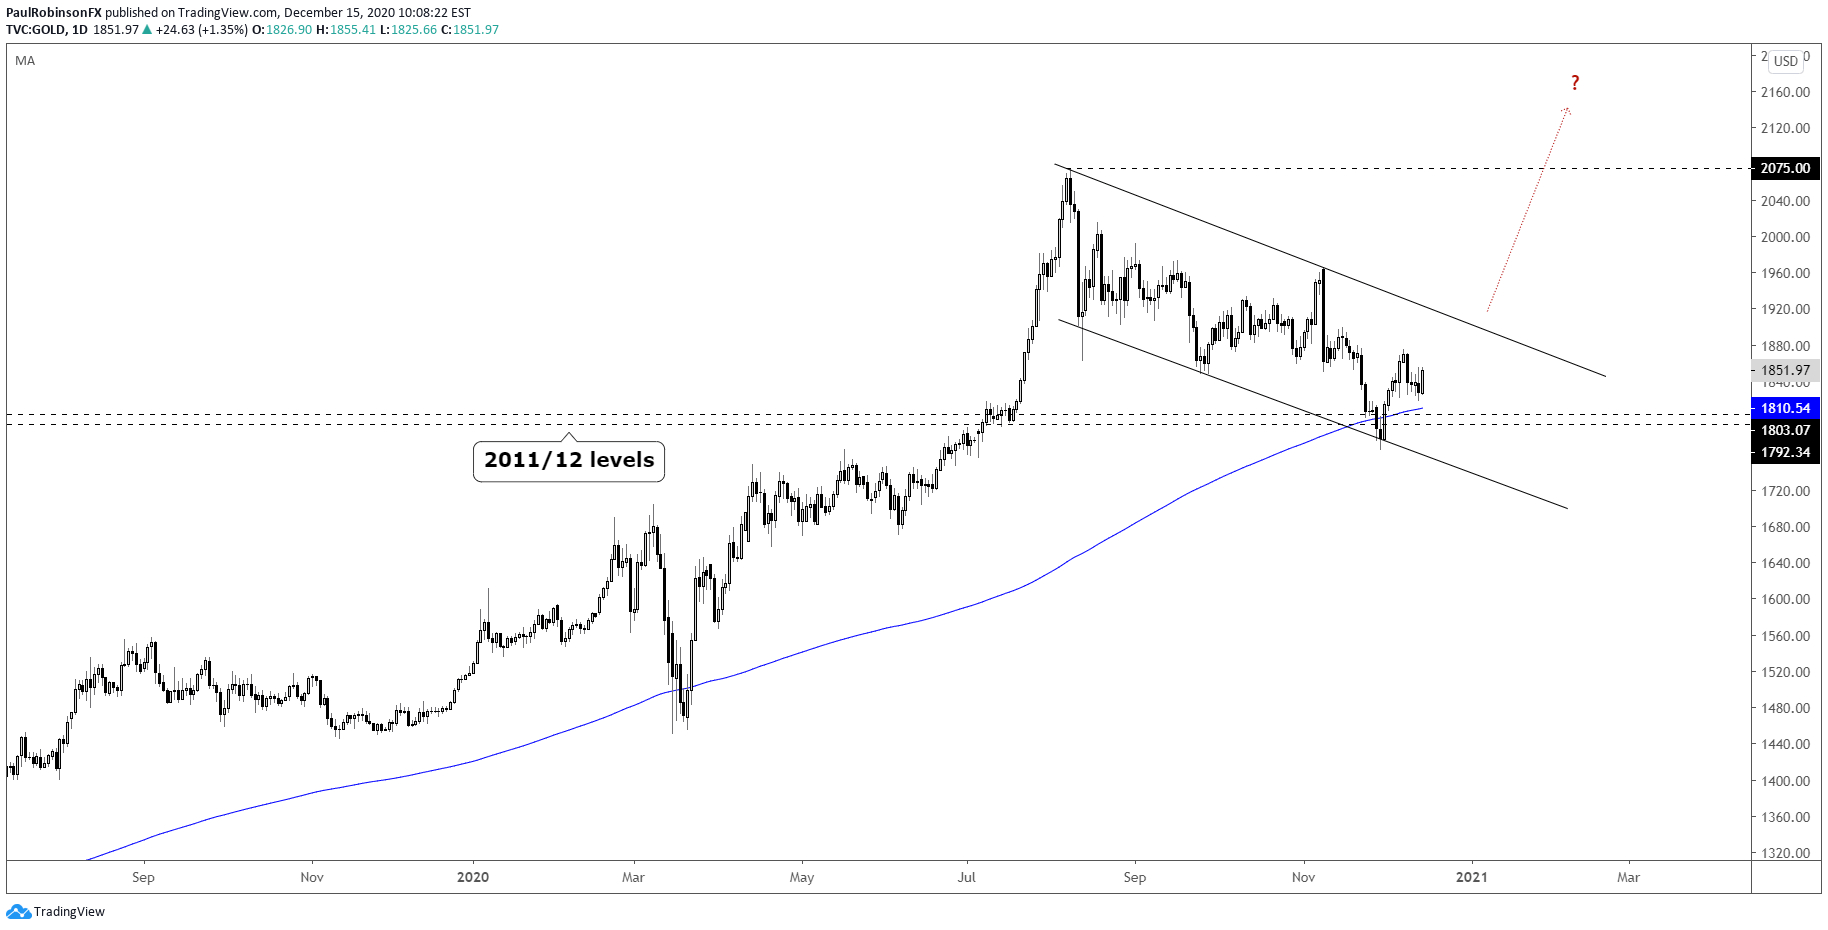 Gold 1Q 2021 Forecast: Gold Outlook Bullish Headed Into regarding 2021 Rut Prediction